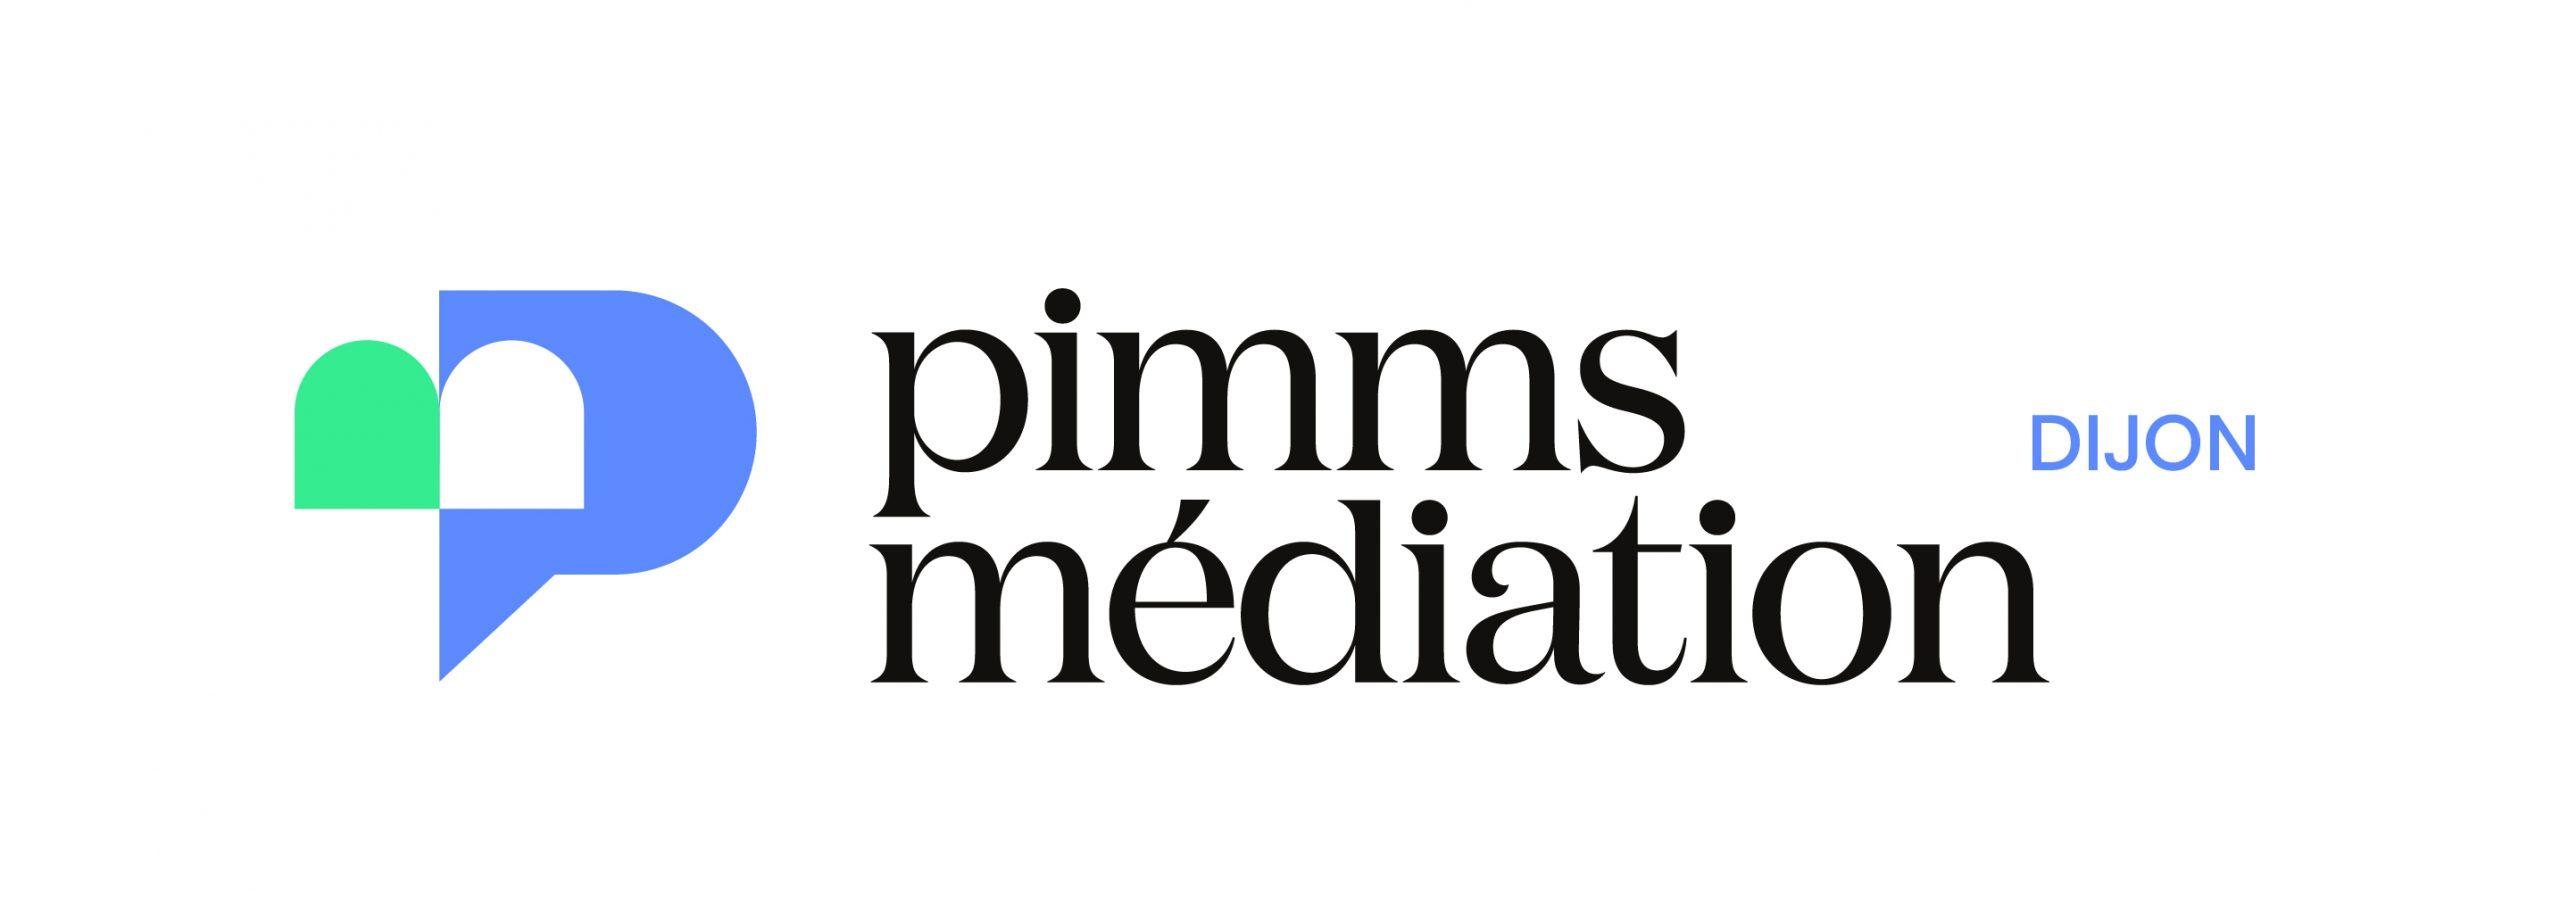 logo Pimms Médiation Dijon avec signature